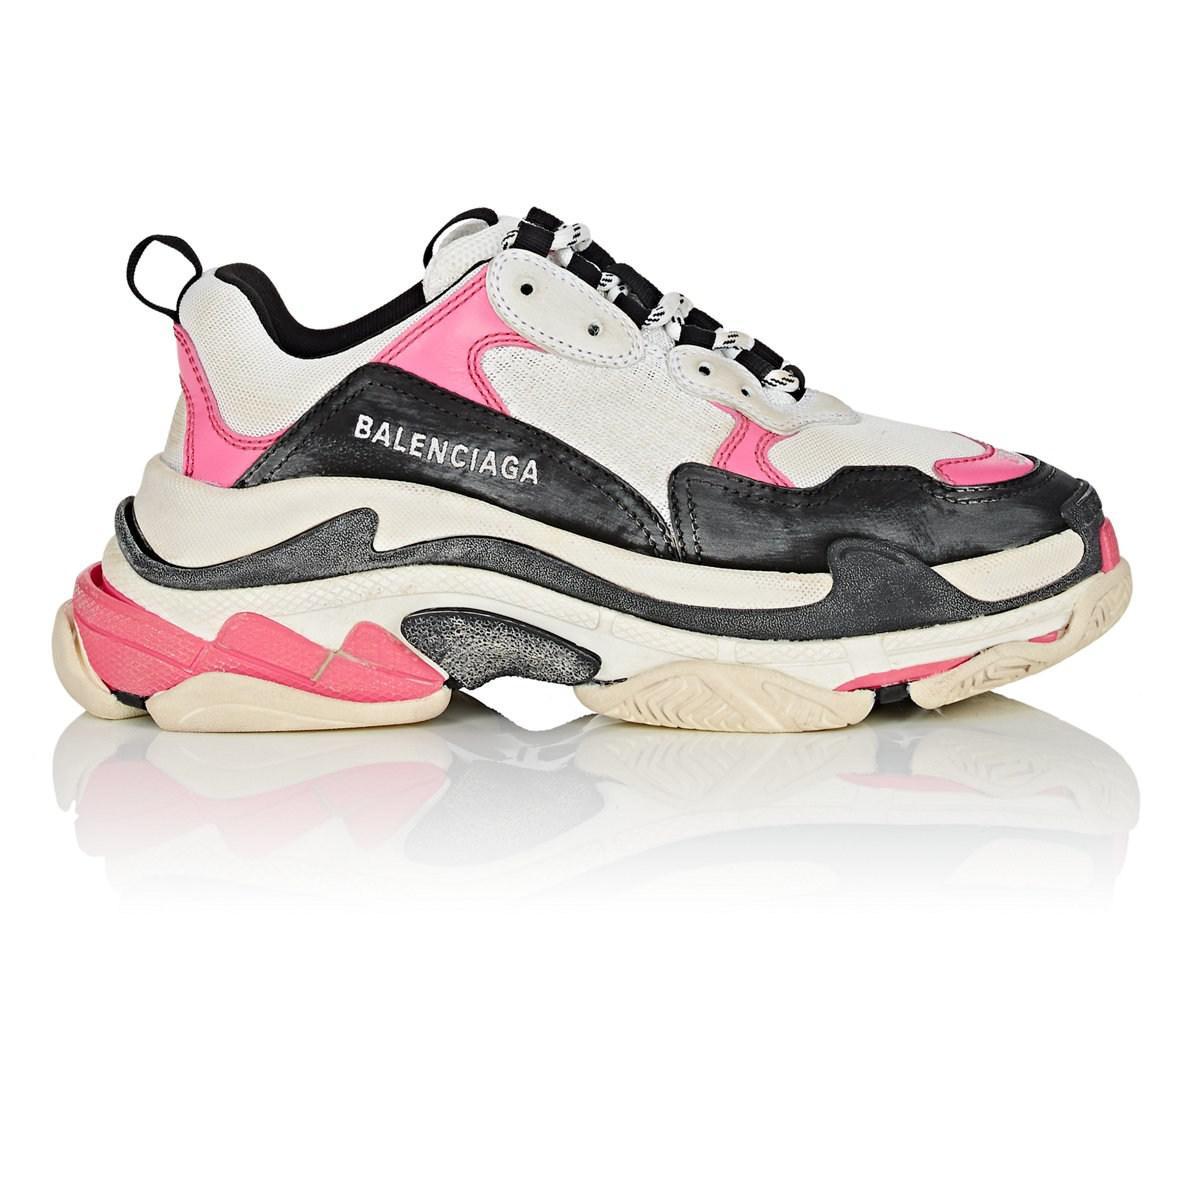 563670bce04f Lyst - Balenciaga Triple S Sneakers in Pink